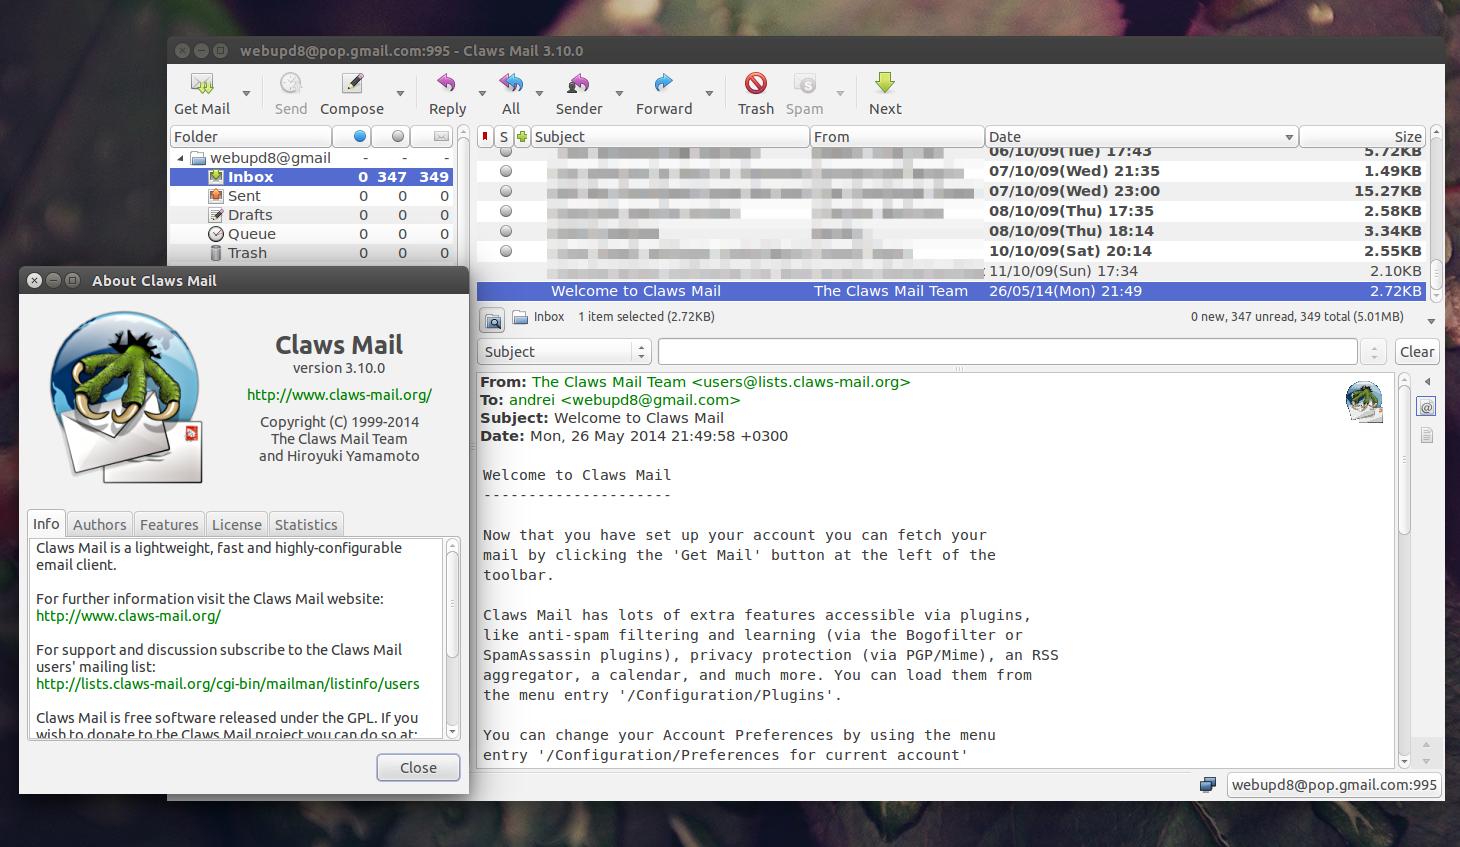 Claws Mail 3.10 Ubuntu